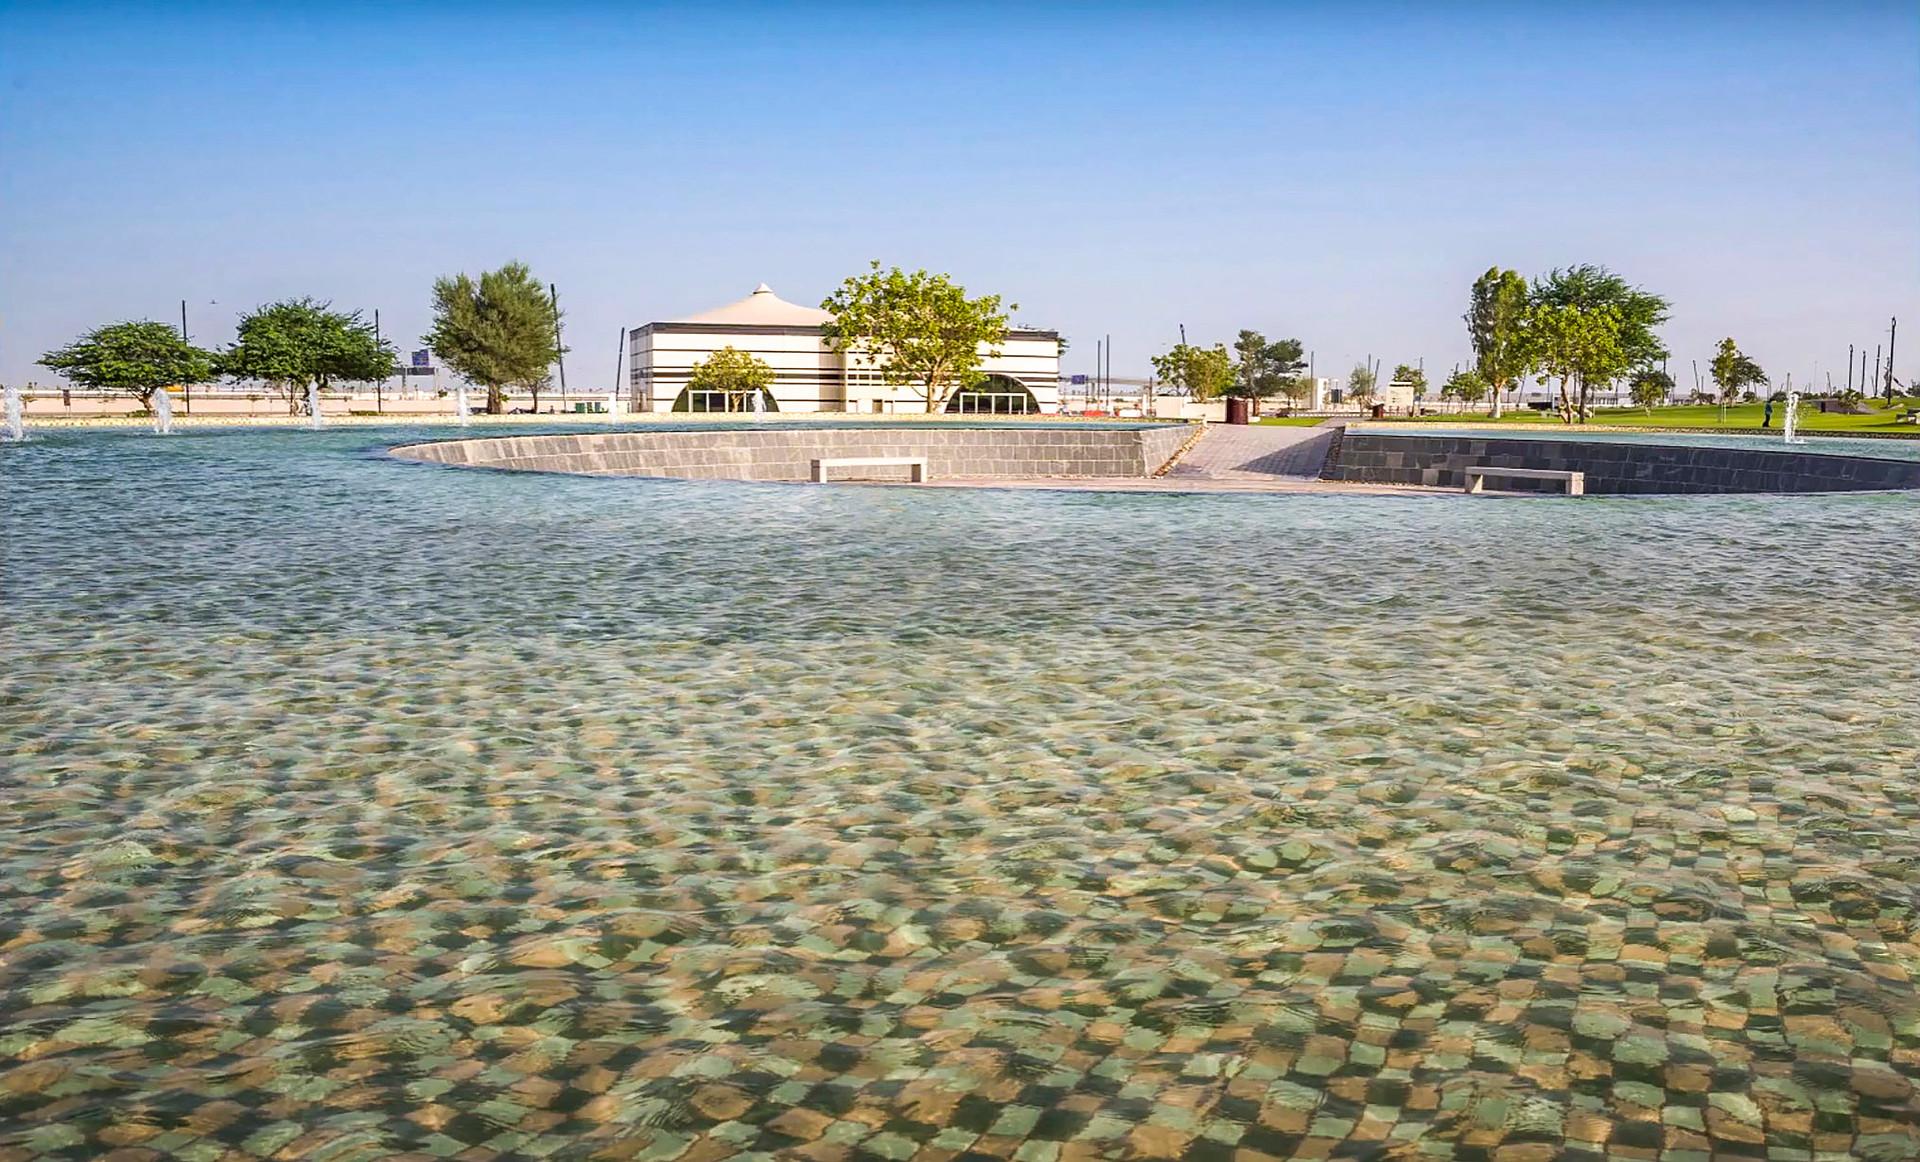 Al-Bayt-Stadium-water-feature-landscape-